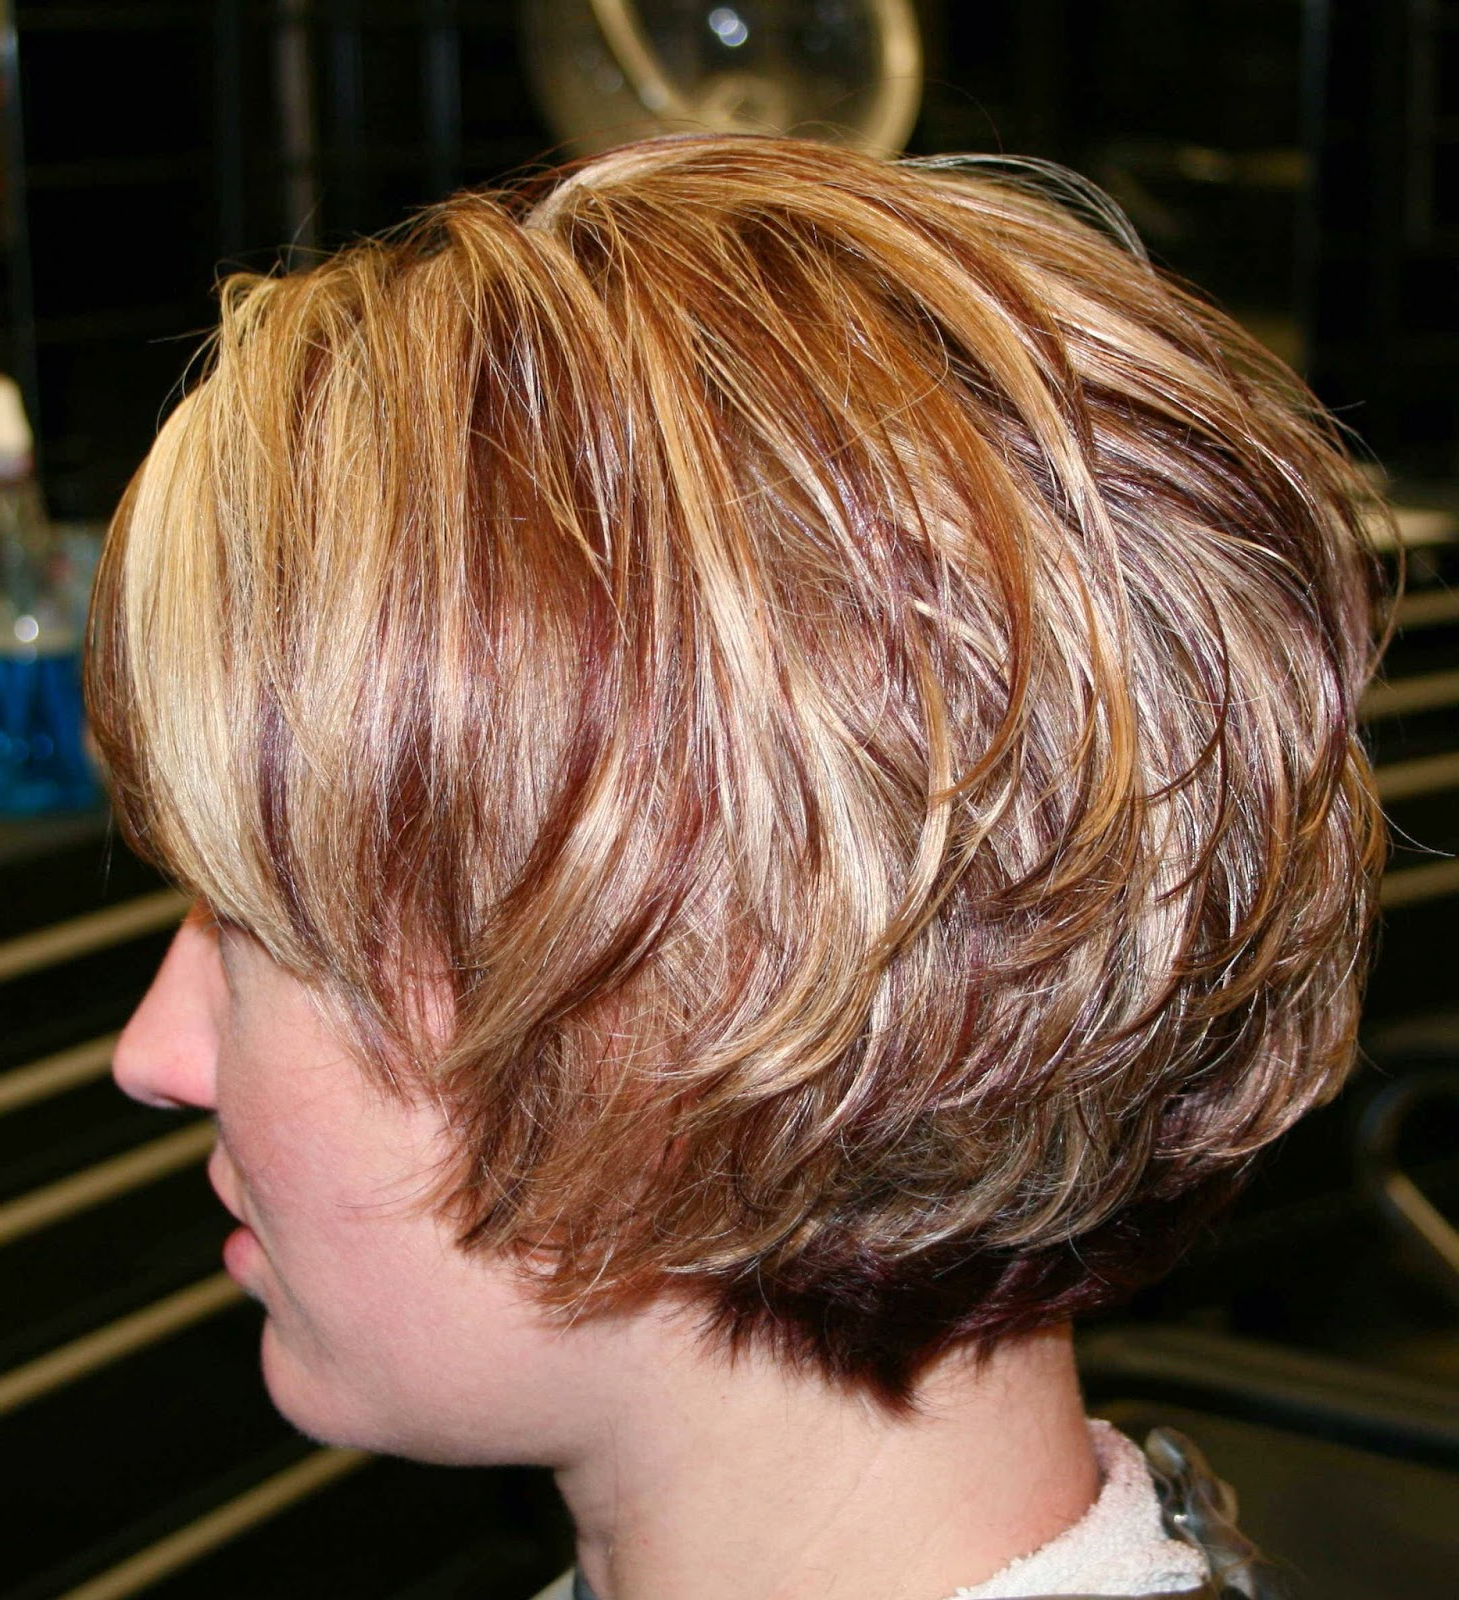 Diapersdeadlinesdiy: Short Hairstyles For Women Over 50 Intended For Choppy Short Hairstyles For Older Women (Gallery 23 of 25)